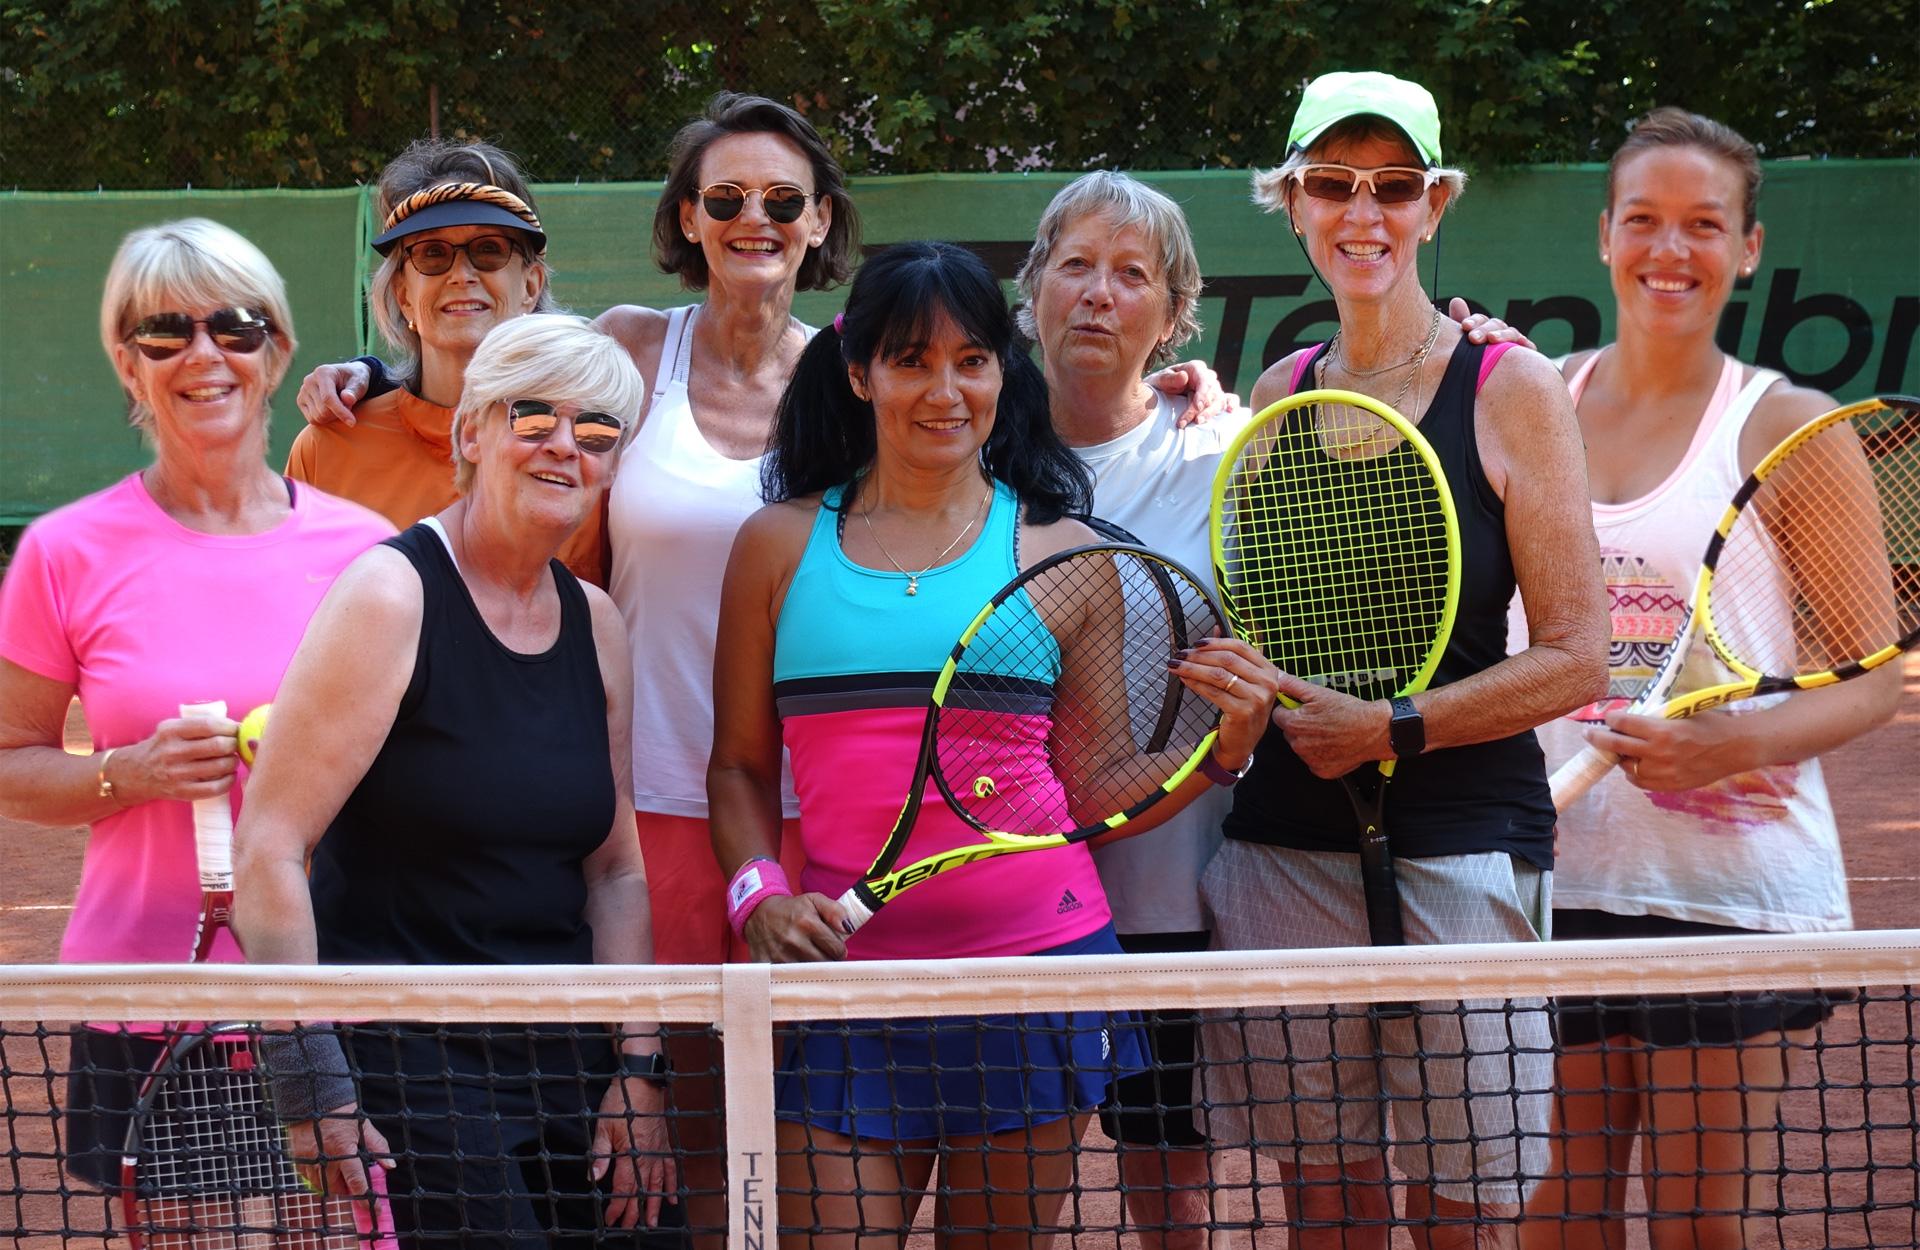 Tennis-Team_Final-Version.jpg